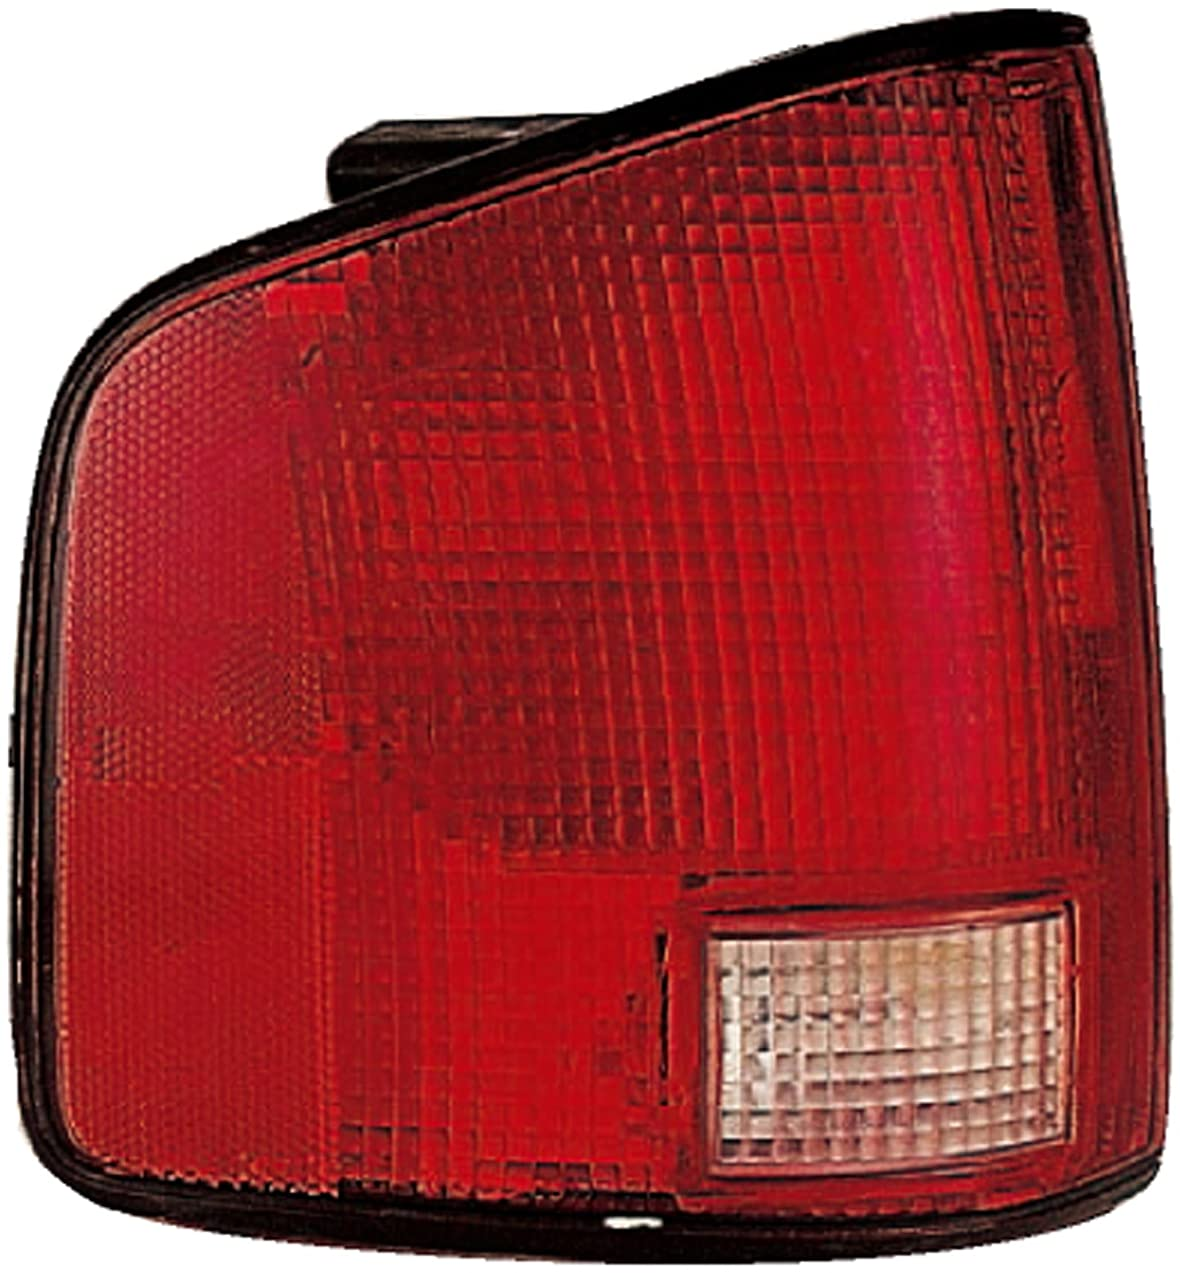 Dorman 1610000 Chevrolet / GMC / Isuzu Driver Side Tail Light wjlmqptf186